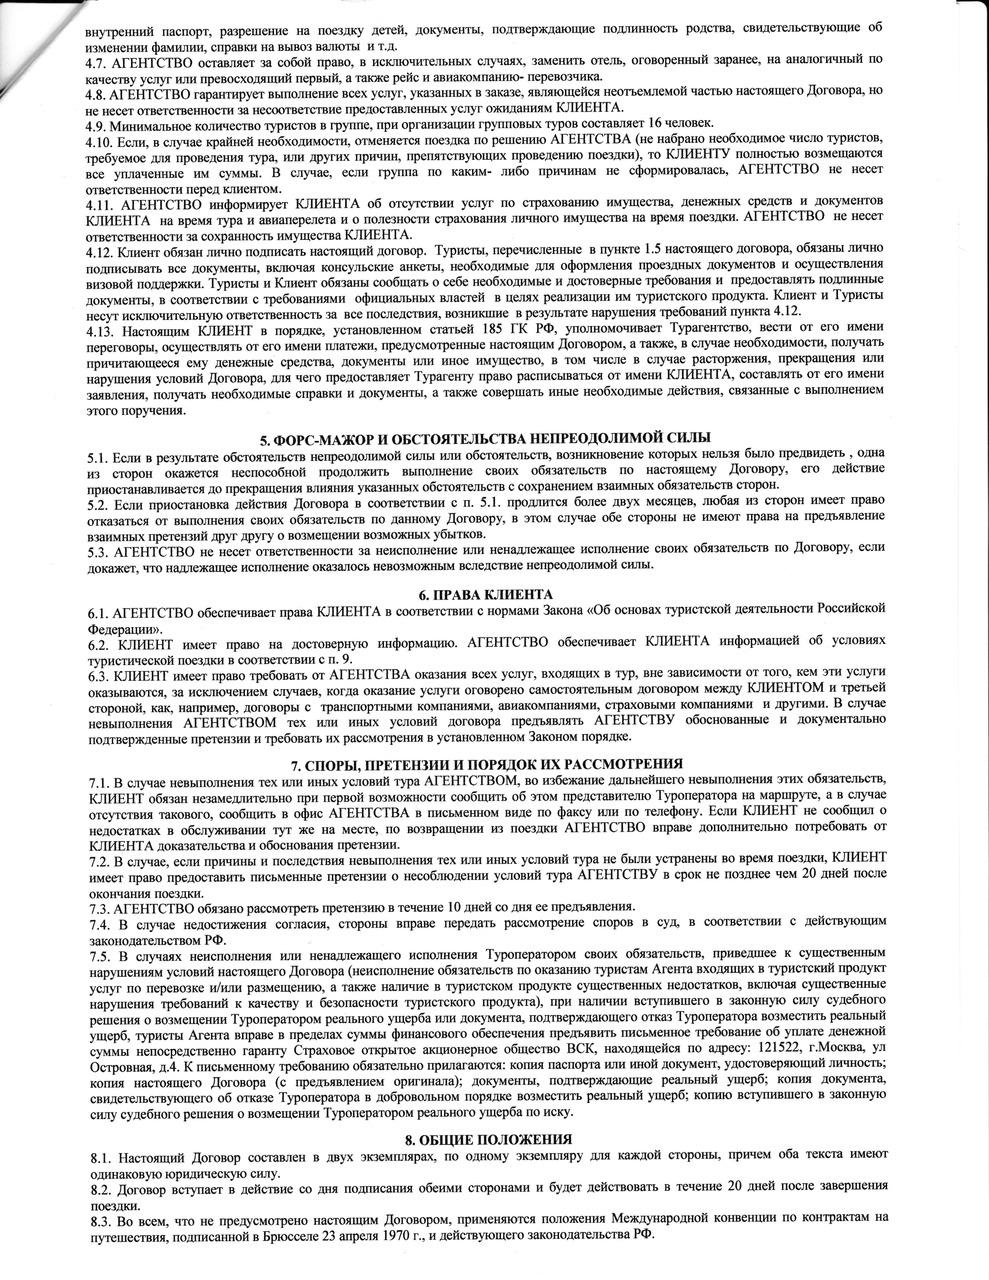 ekaterinatkachenko3pbi7y.jpg